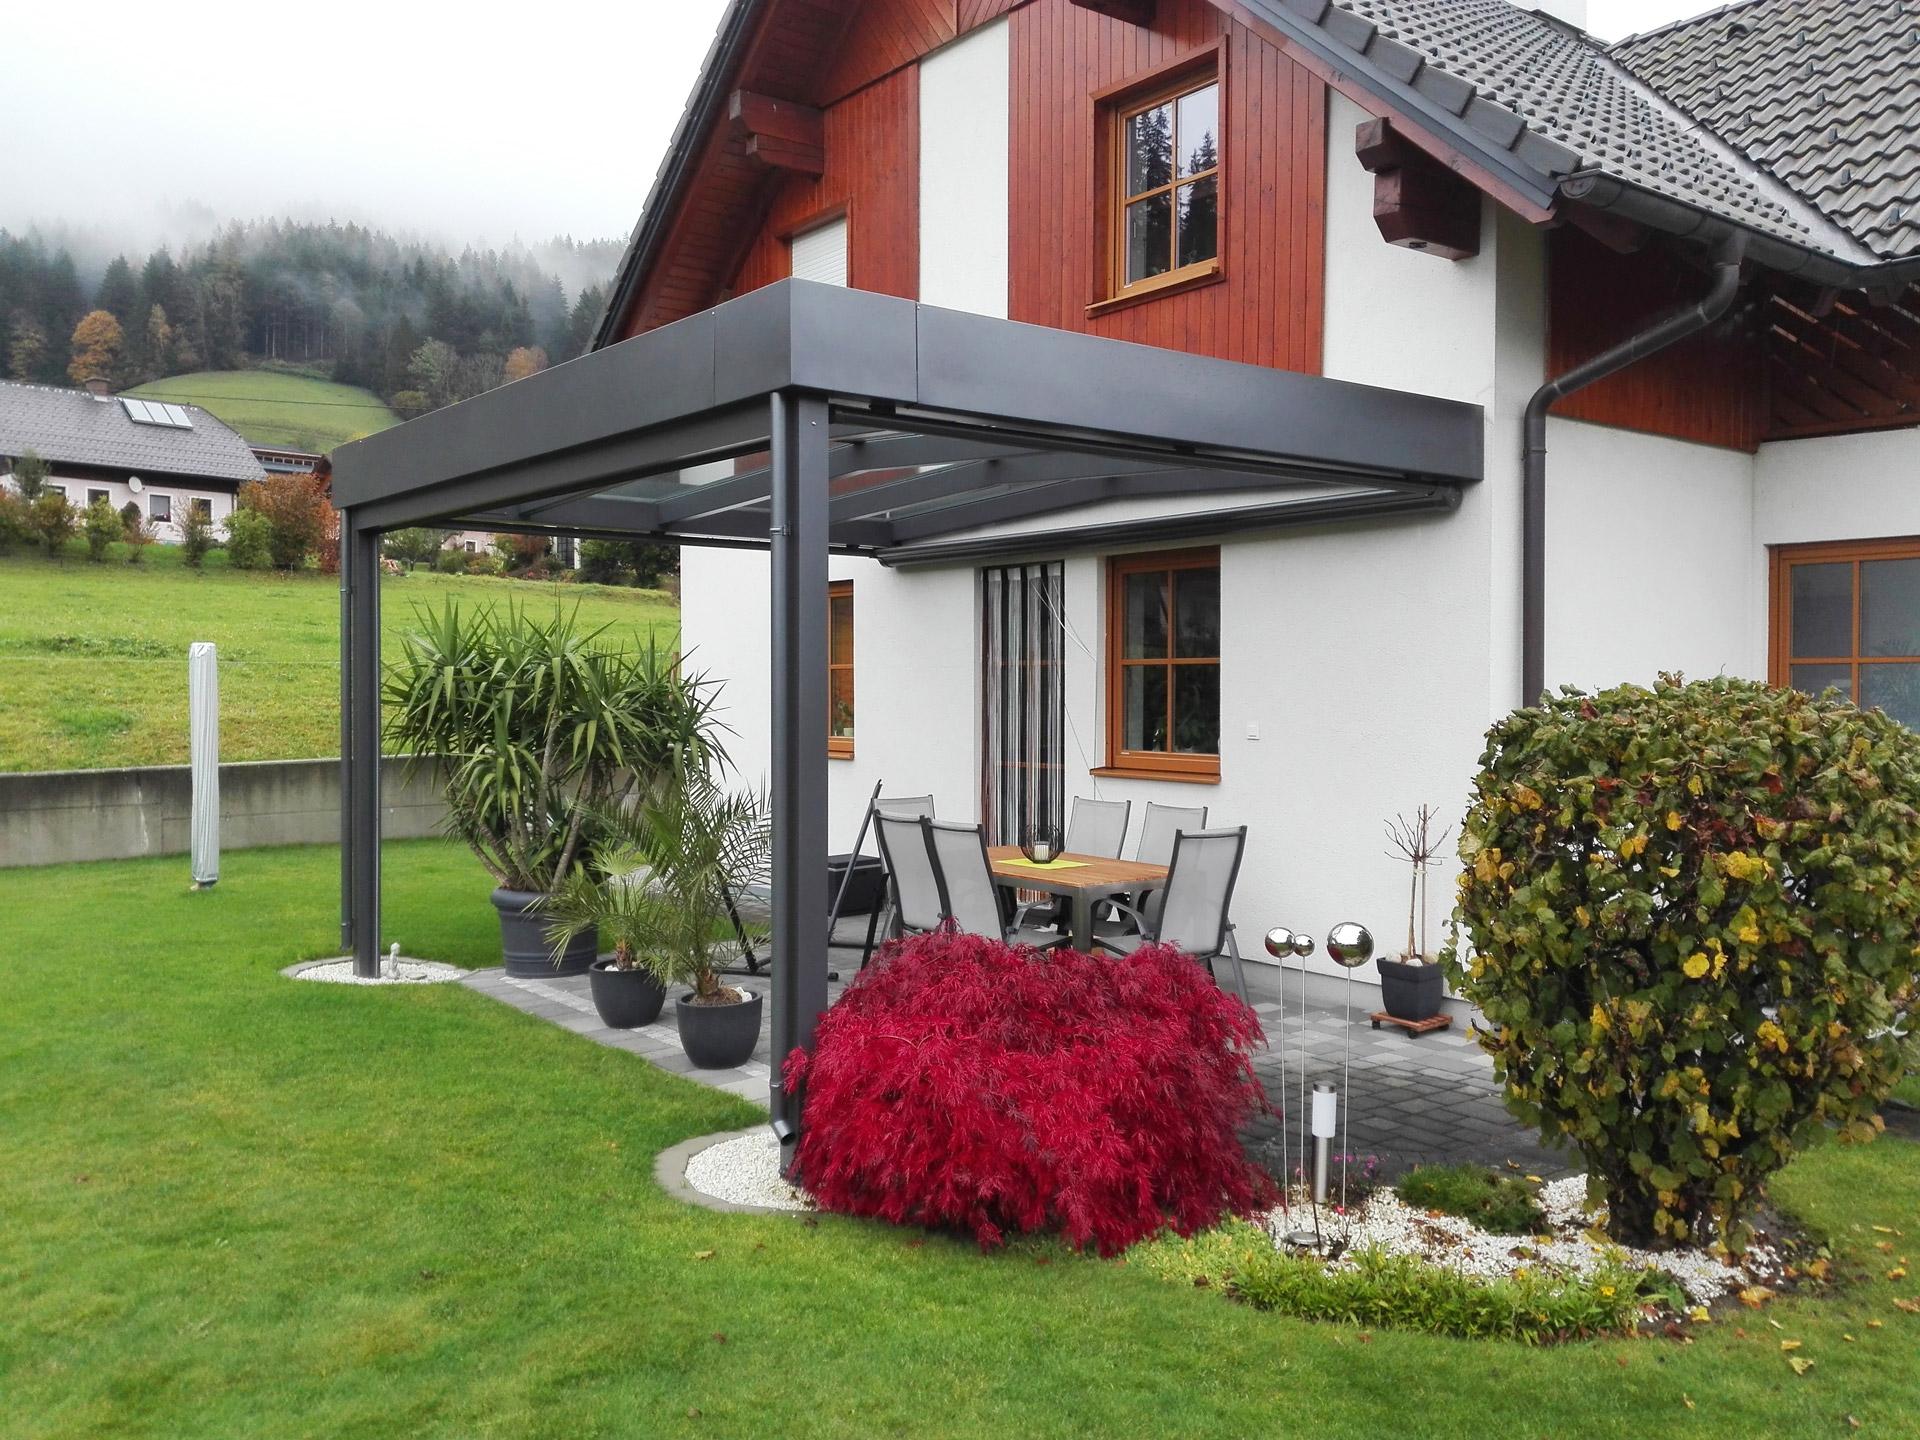 Terrassendach Alu 72 a | moderne Flachdach Optik dank Attika-Verblechung, dunkelgrau | Svoboda